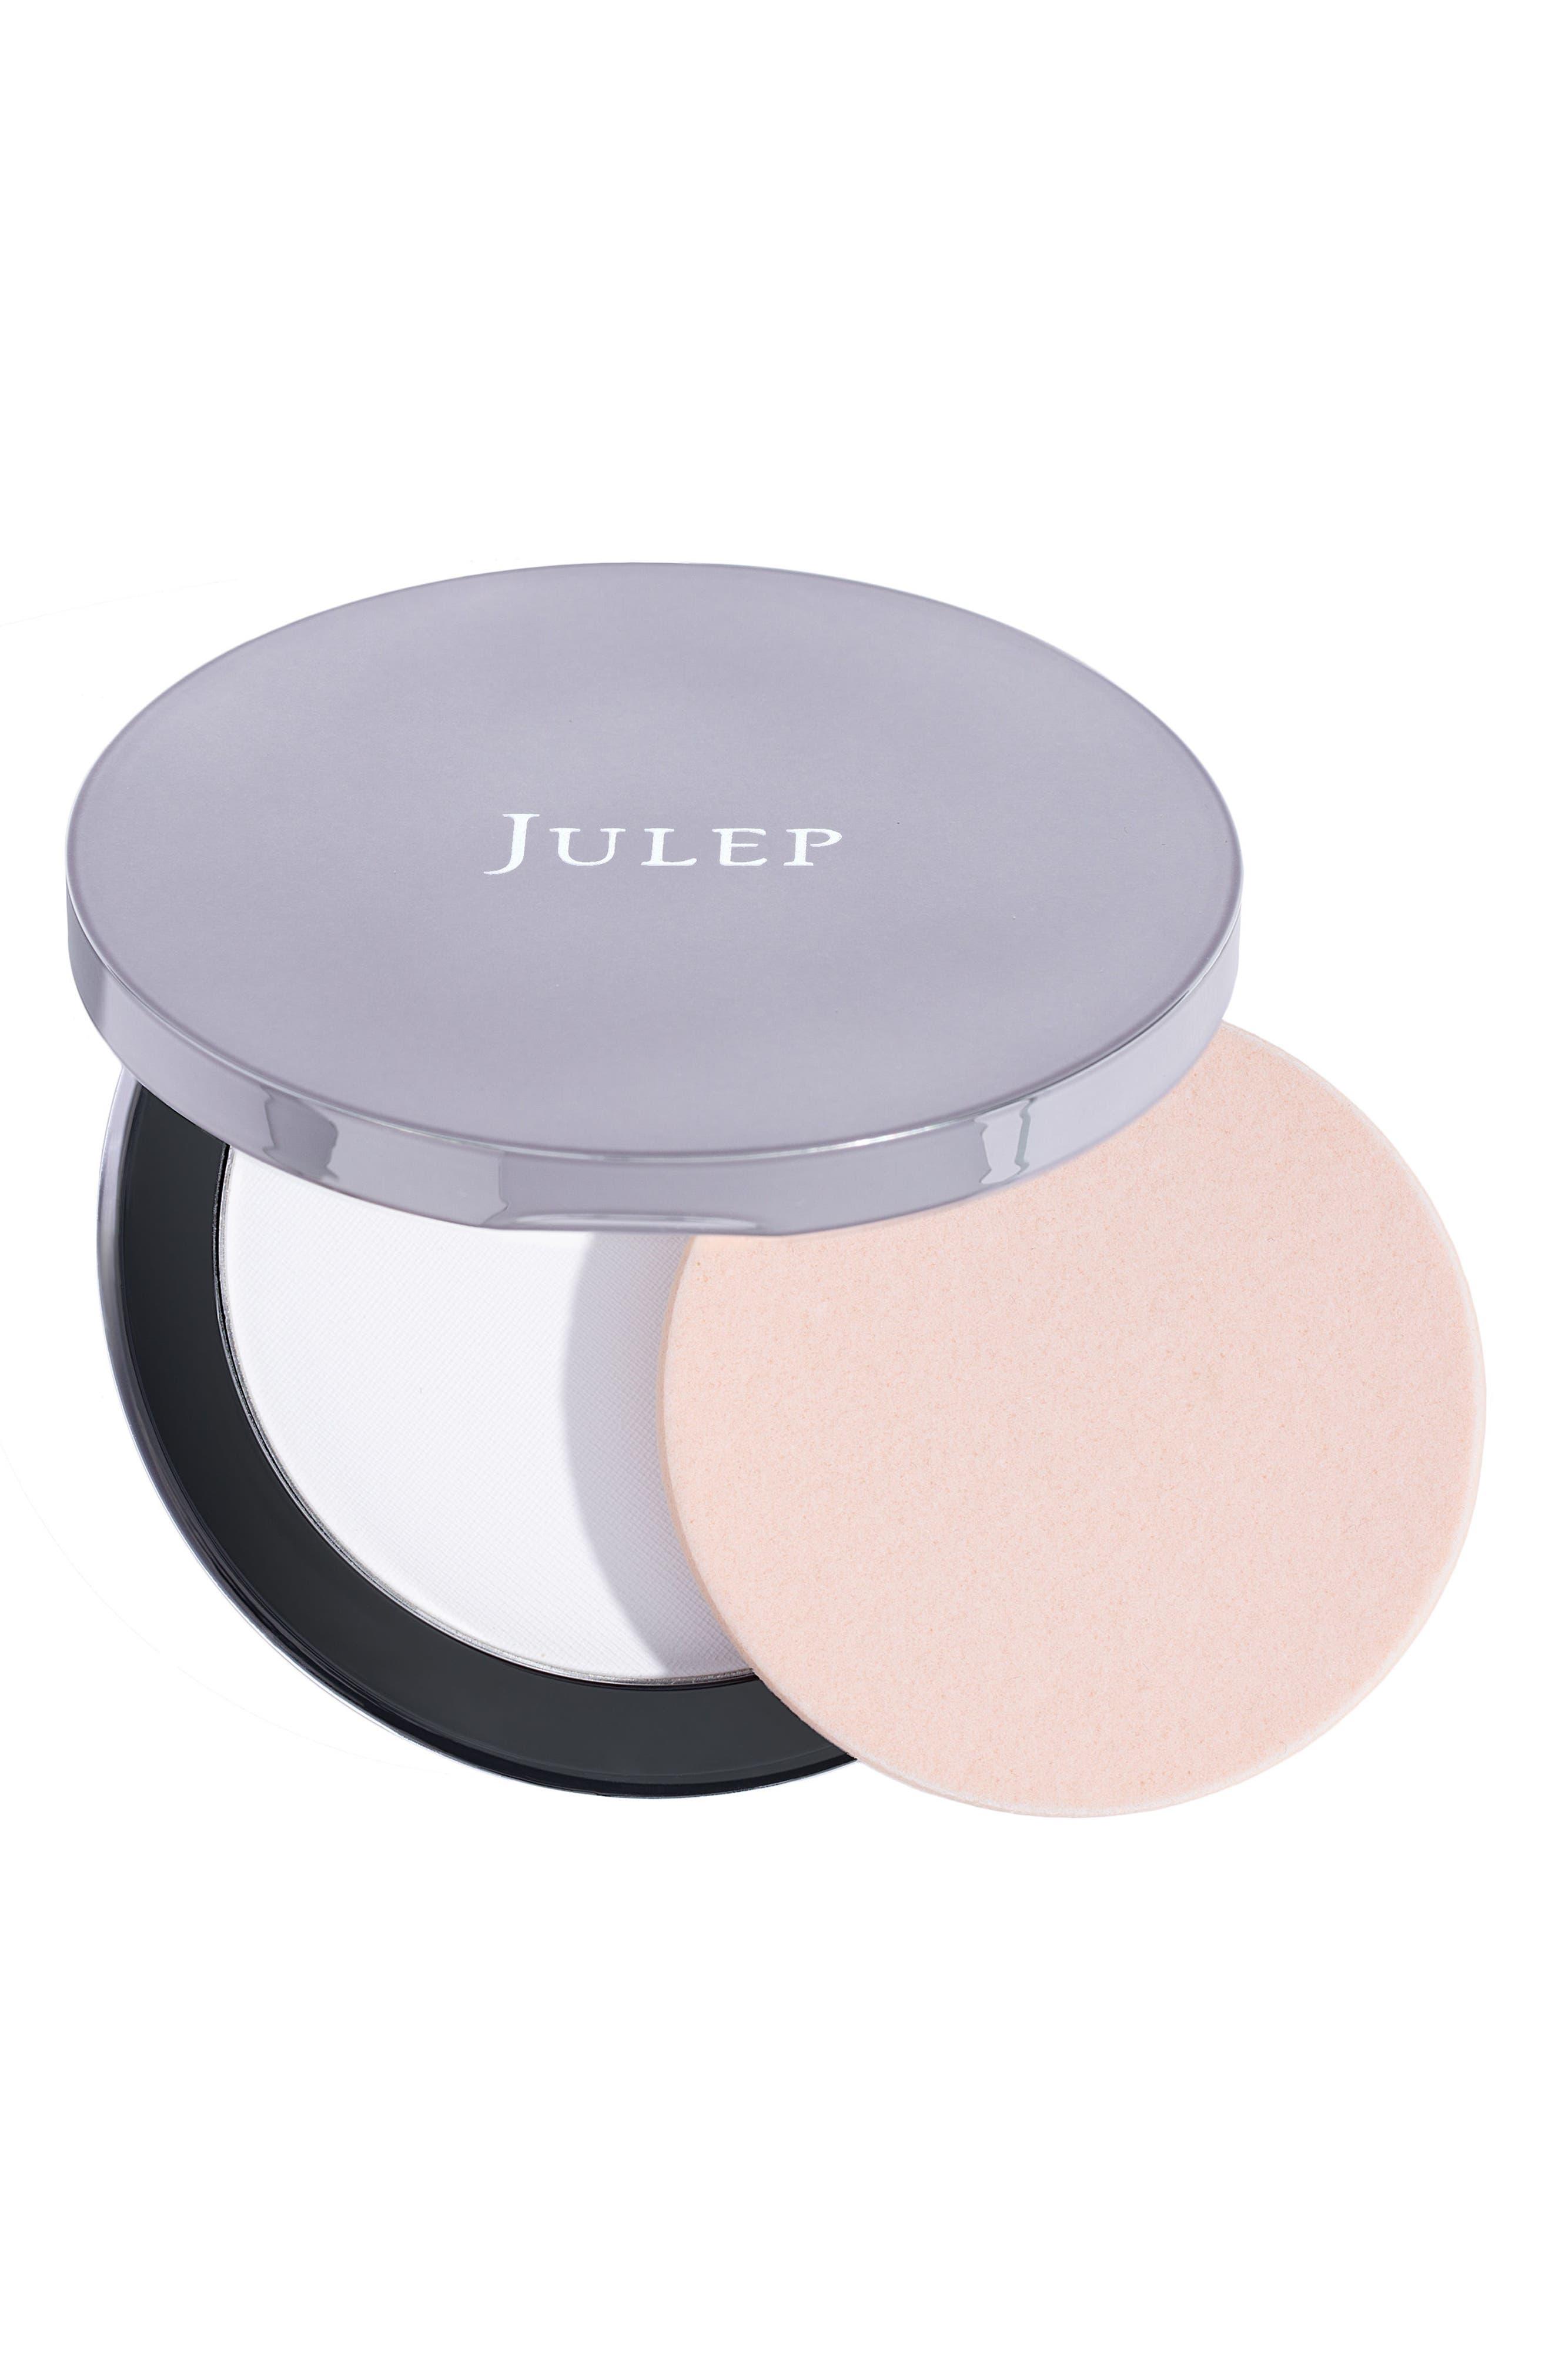 Julep™ Insta-Filter Invisible Finishing Powder